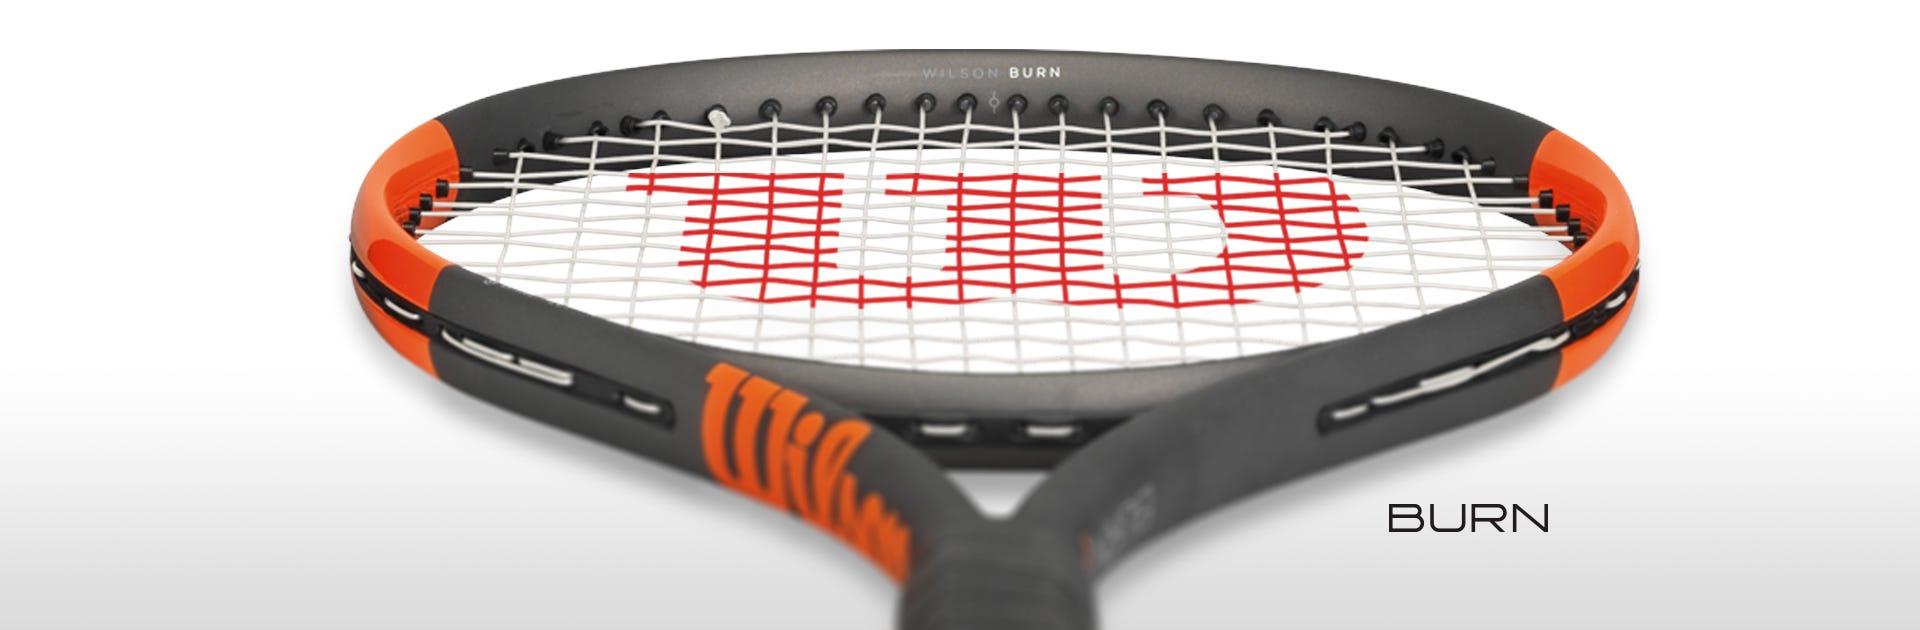 Burn Tennis Rackets